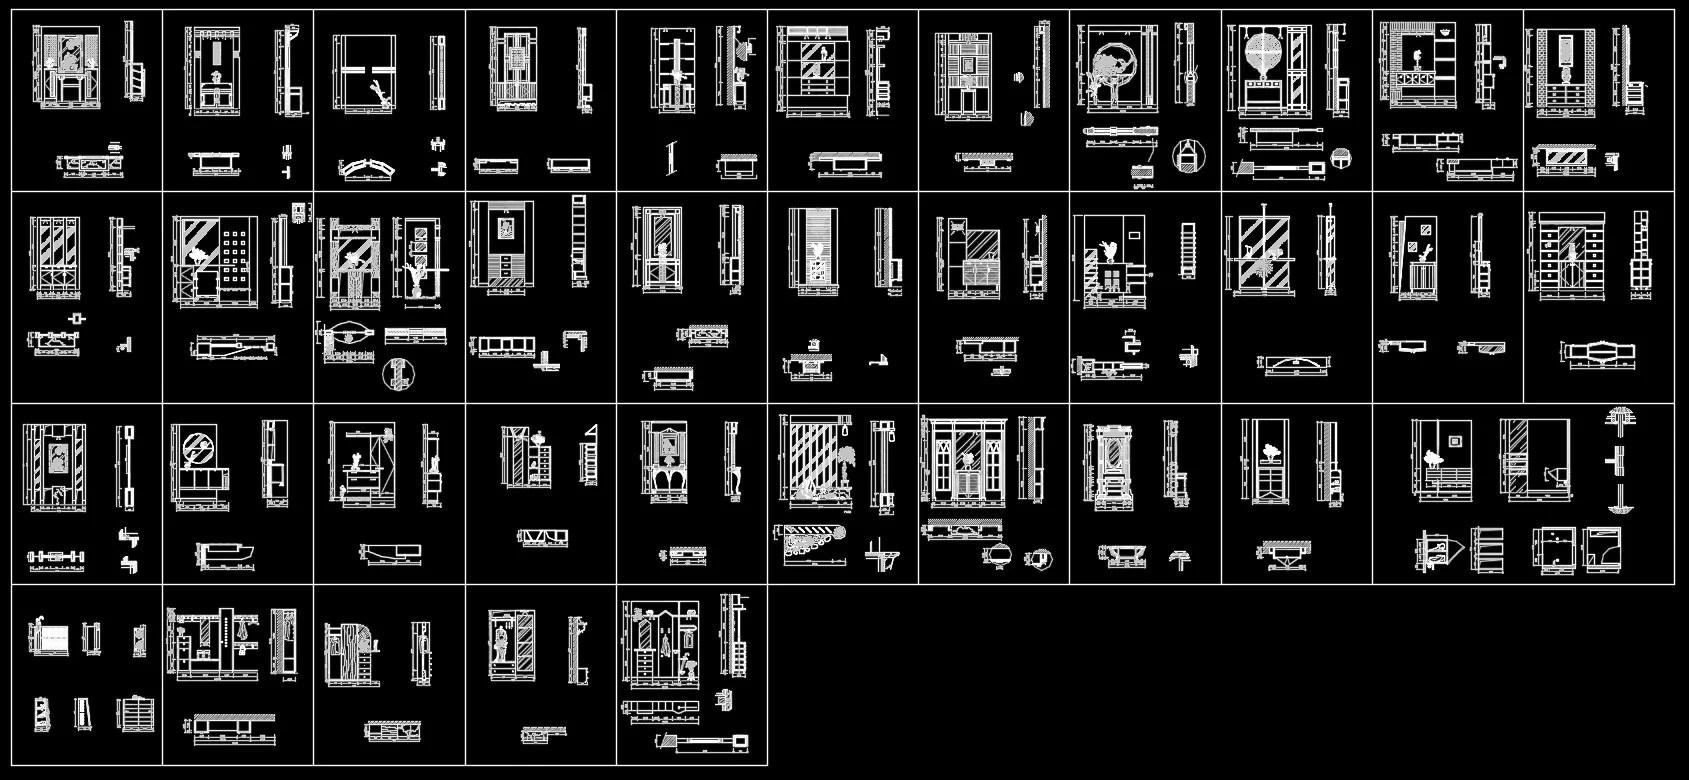 38 Types of Entrance Design